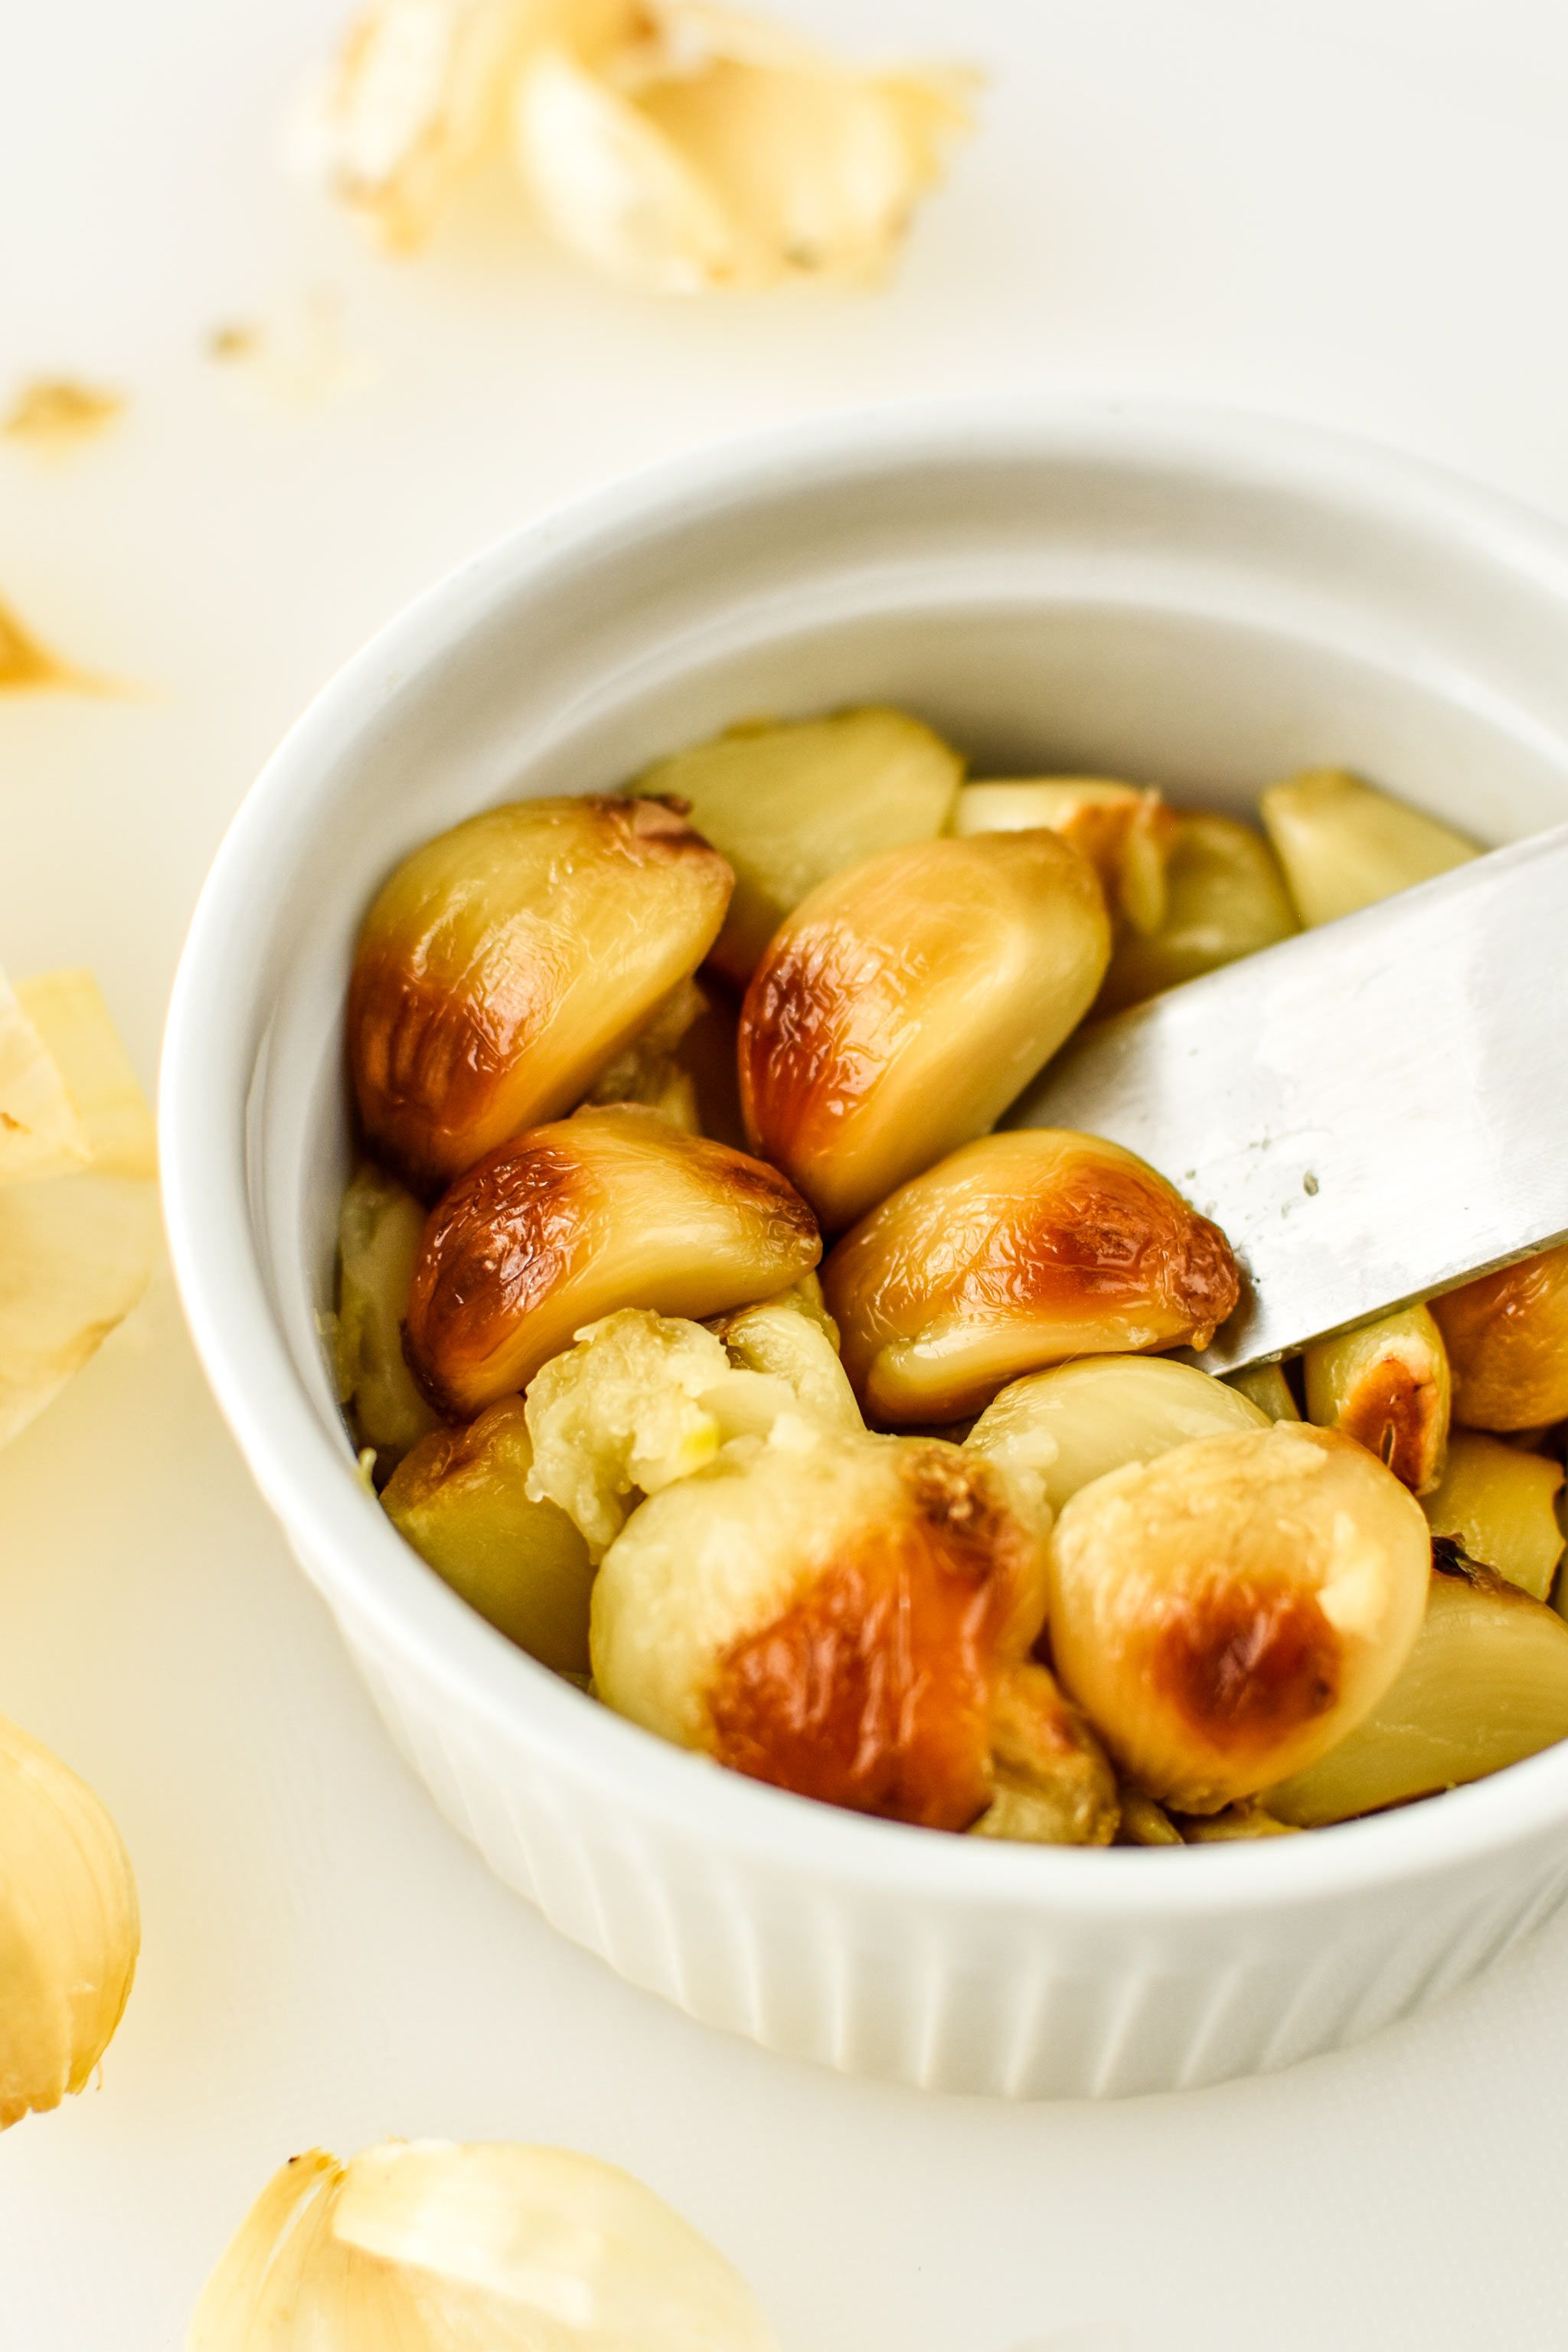 How to Roast Garlic in an Air Fryer Recipe Air fryer